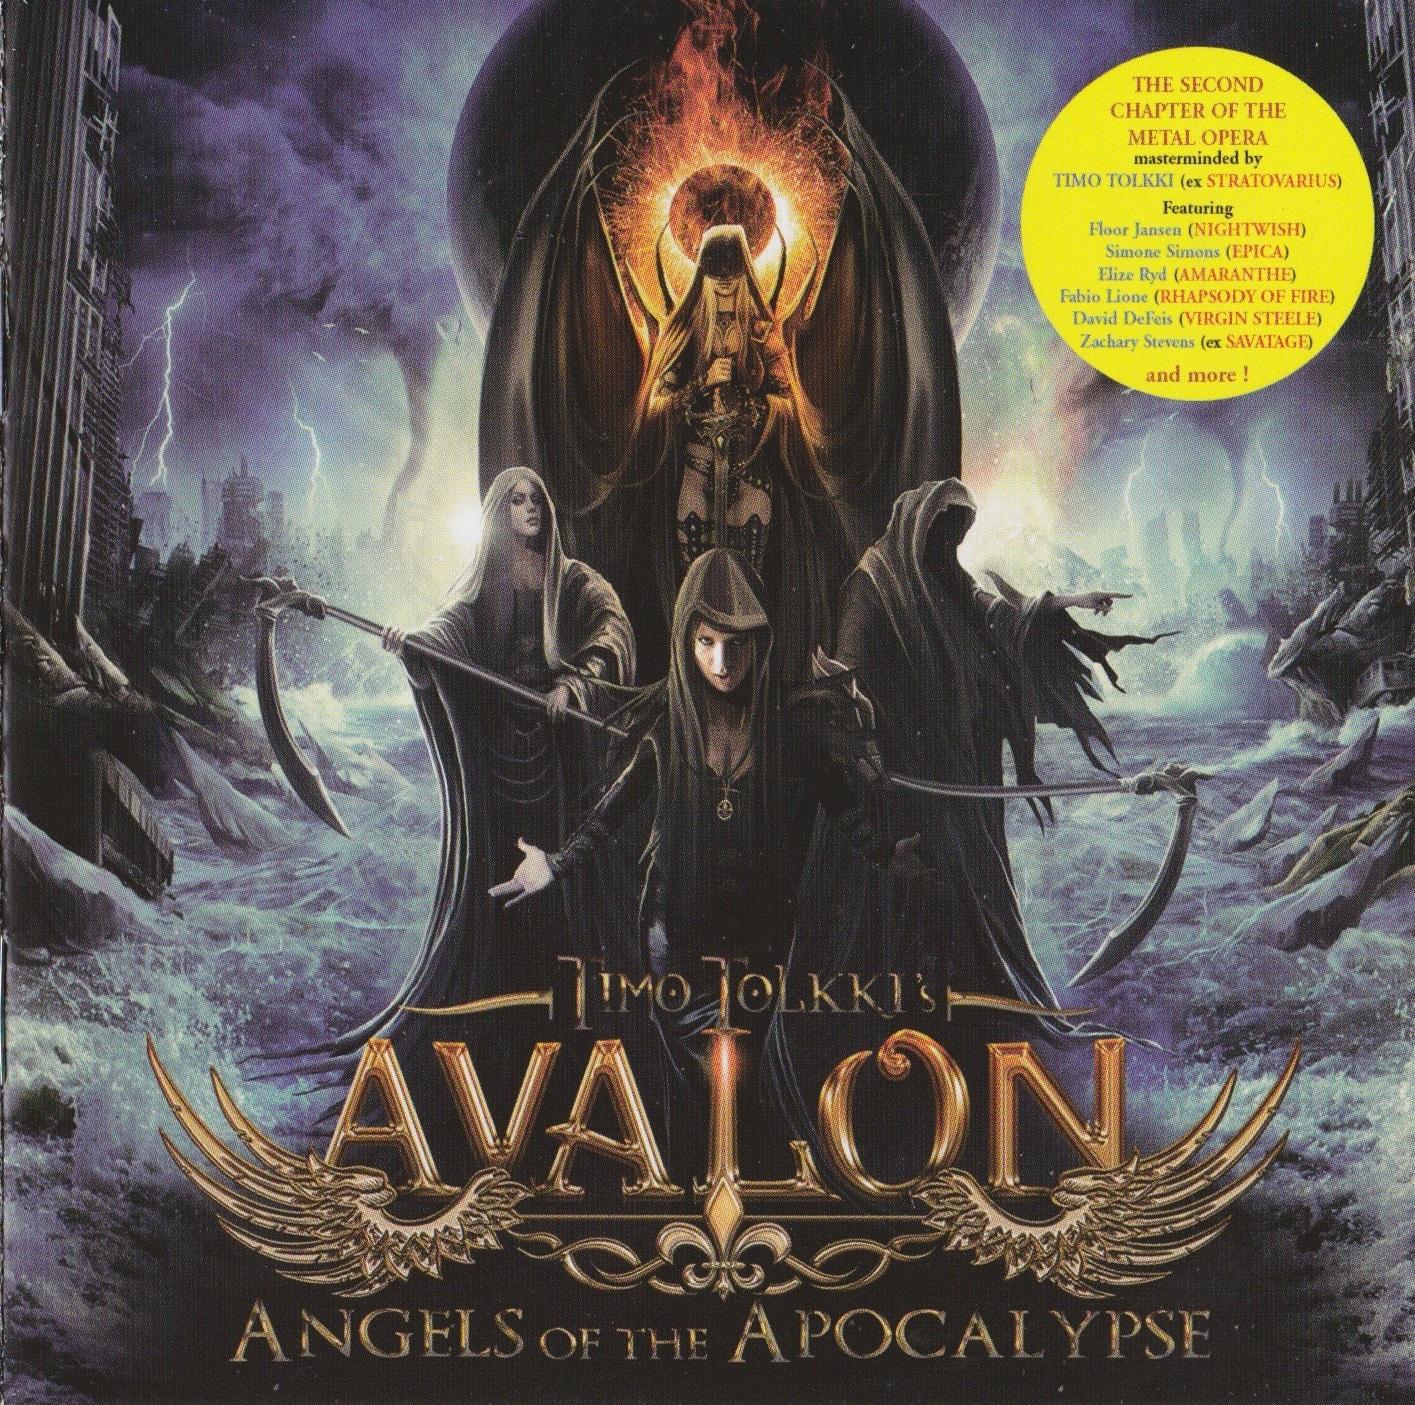 Timo Tolkki's Avalon — Angels of the Apocalypse (2014)